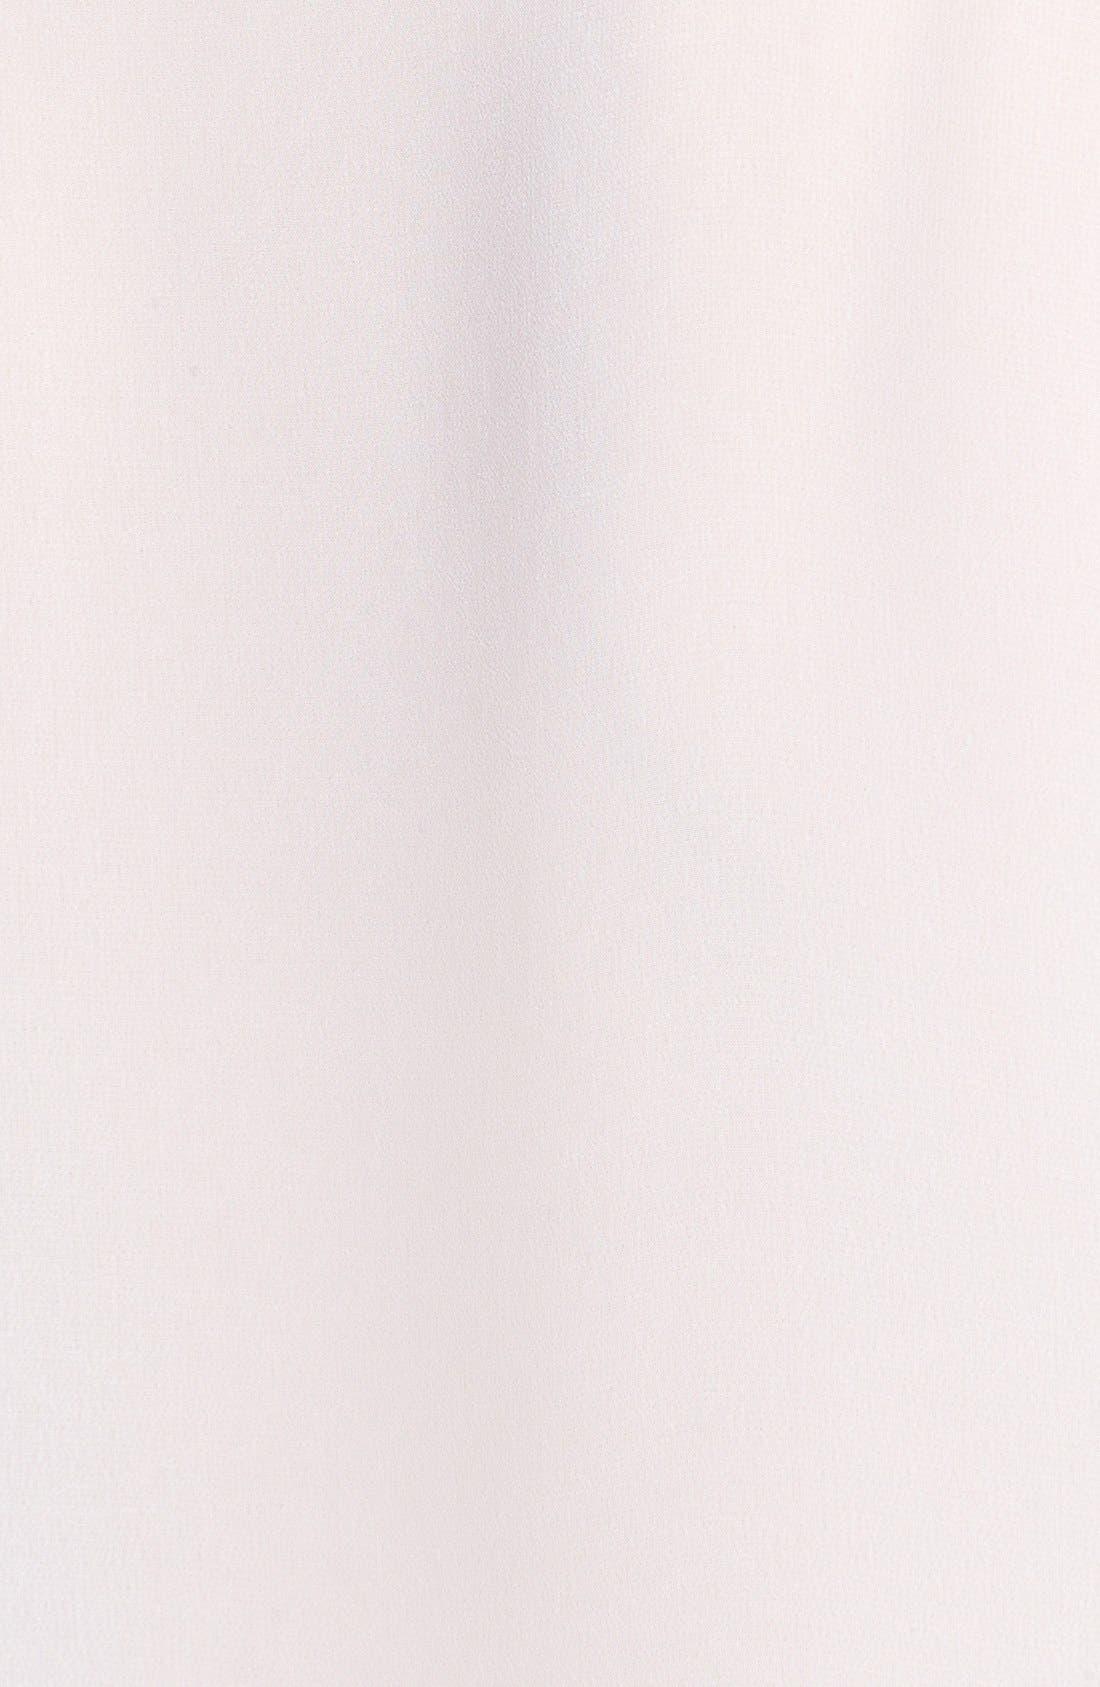 Alternate Image 3  - Vince Camuto 'Flower Fields' Embellished Sheer Sleeve Blouse